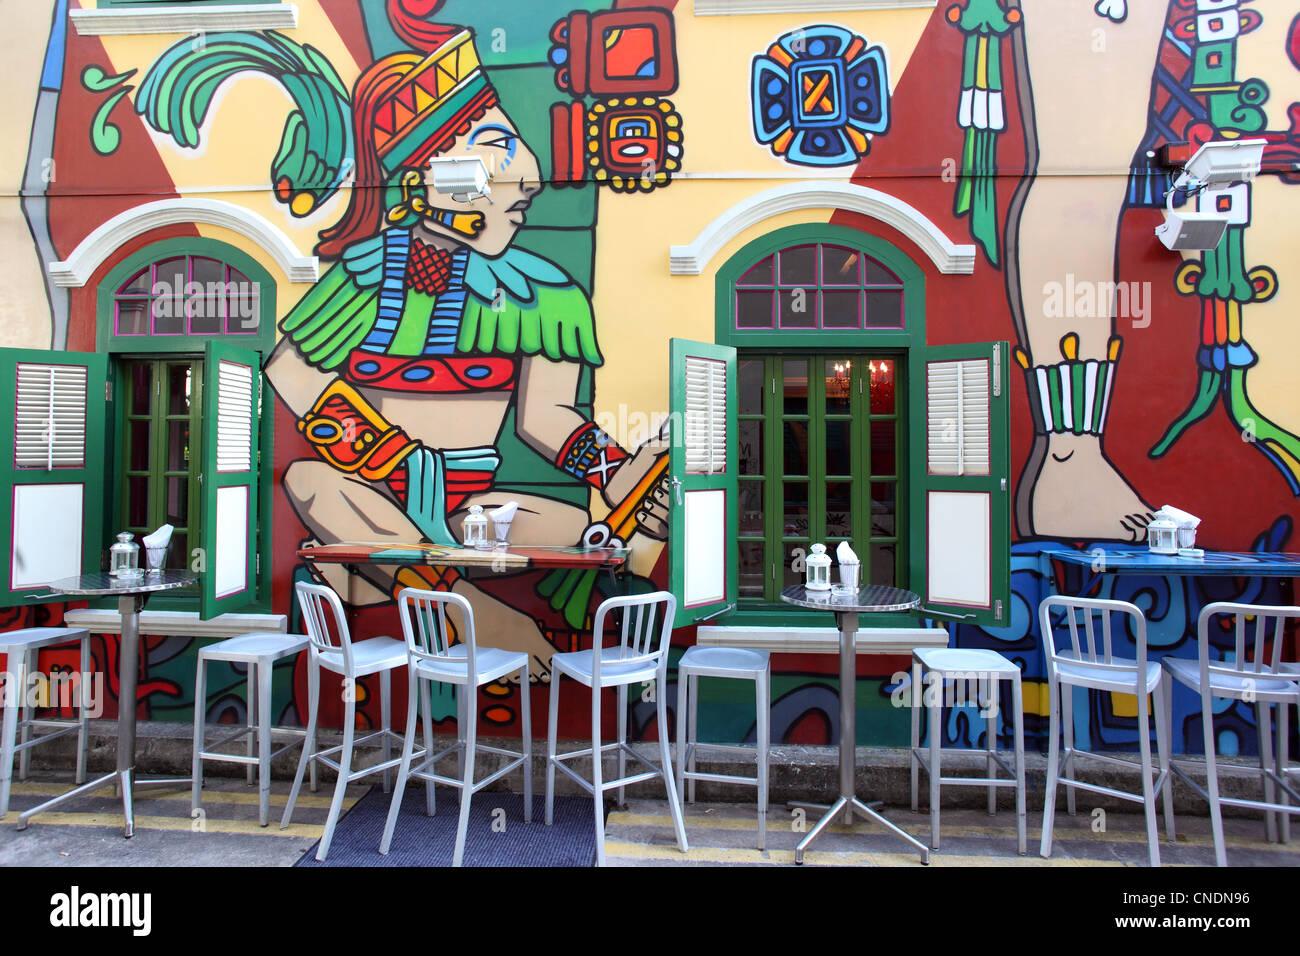 Exterior Wall Mural Stock Photos Exterior Wall Mural Stock Images